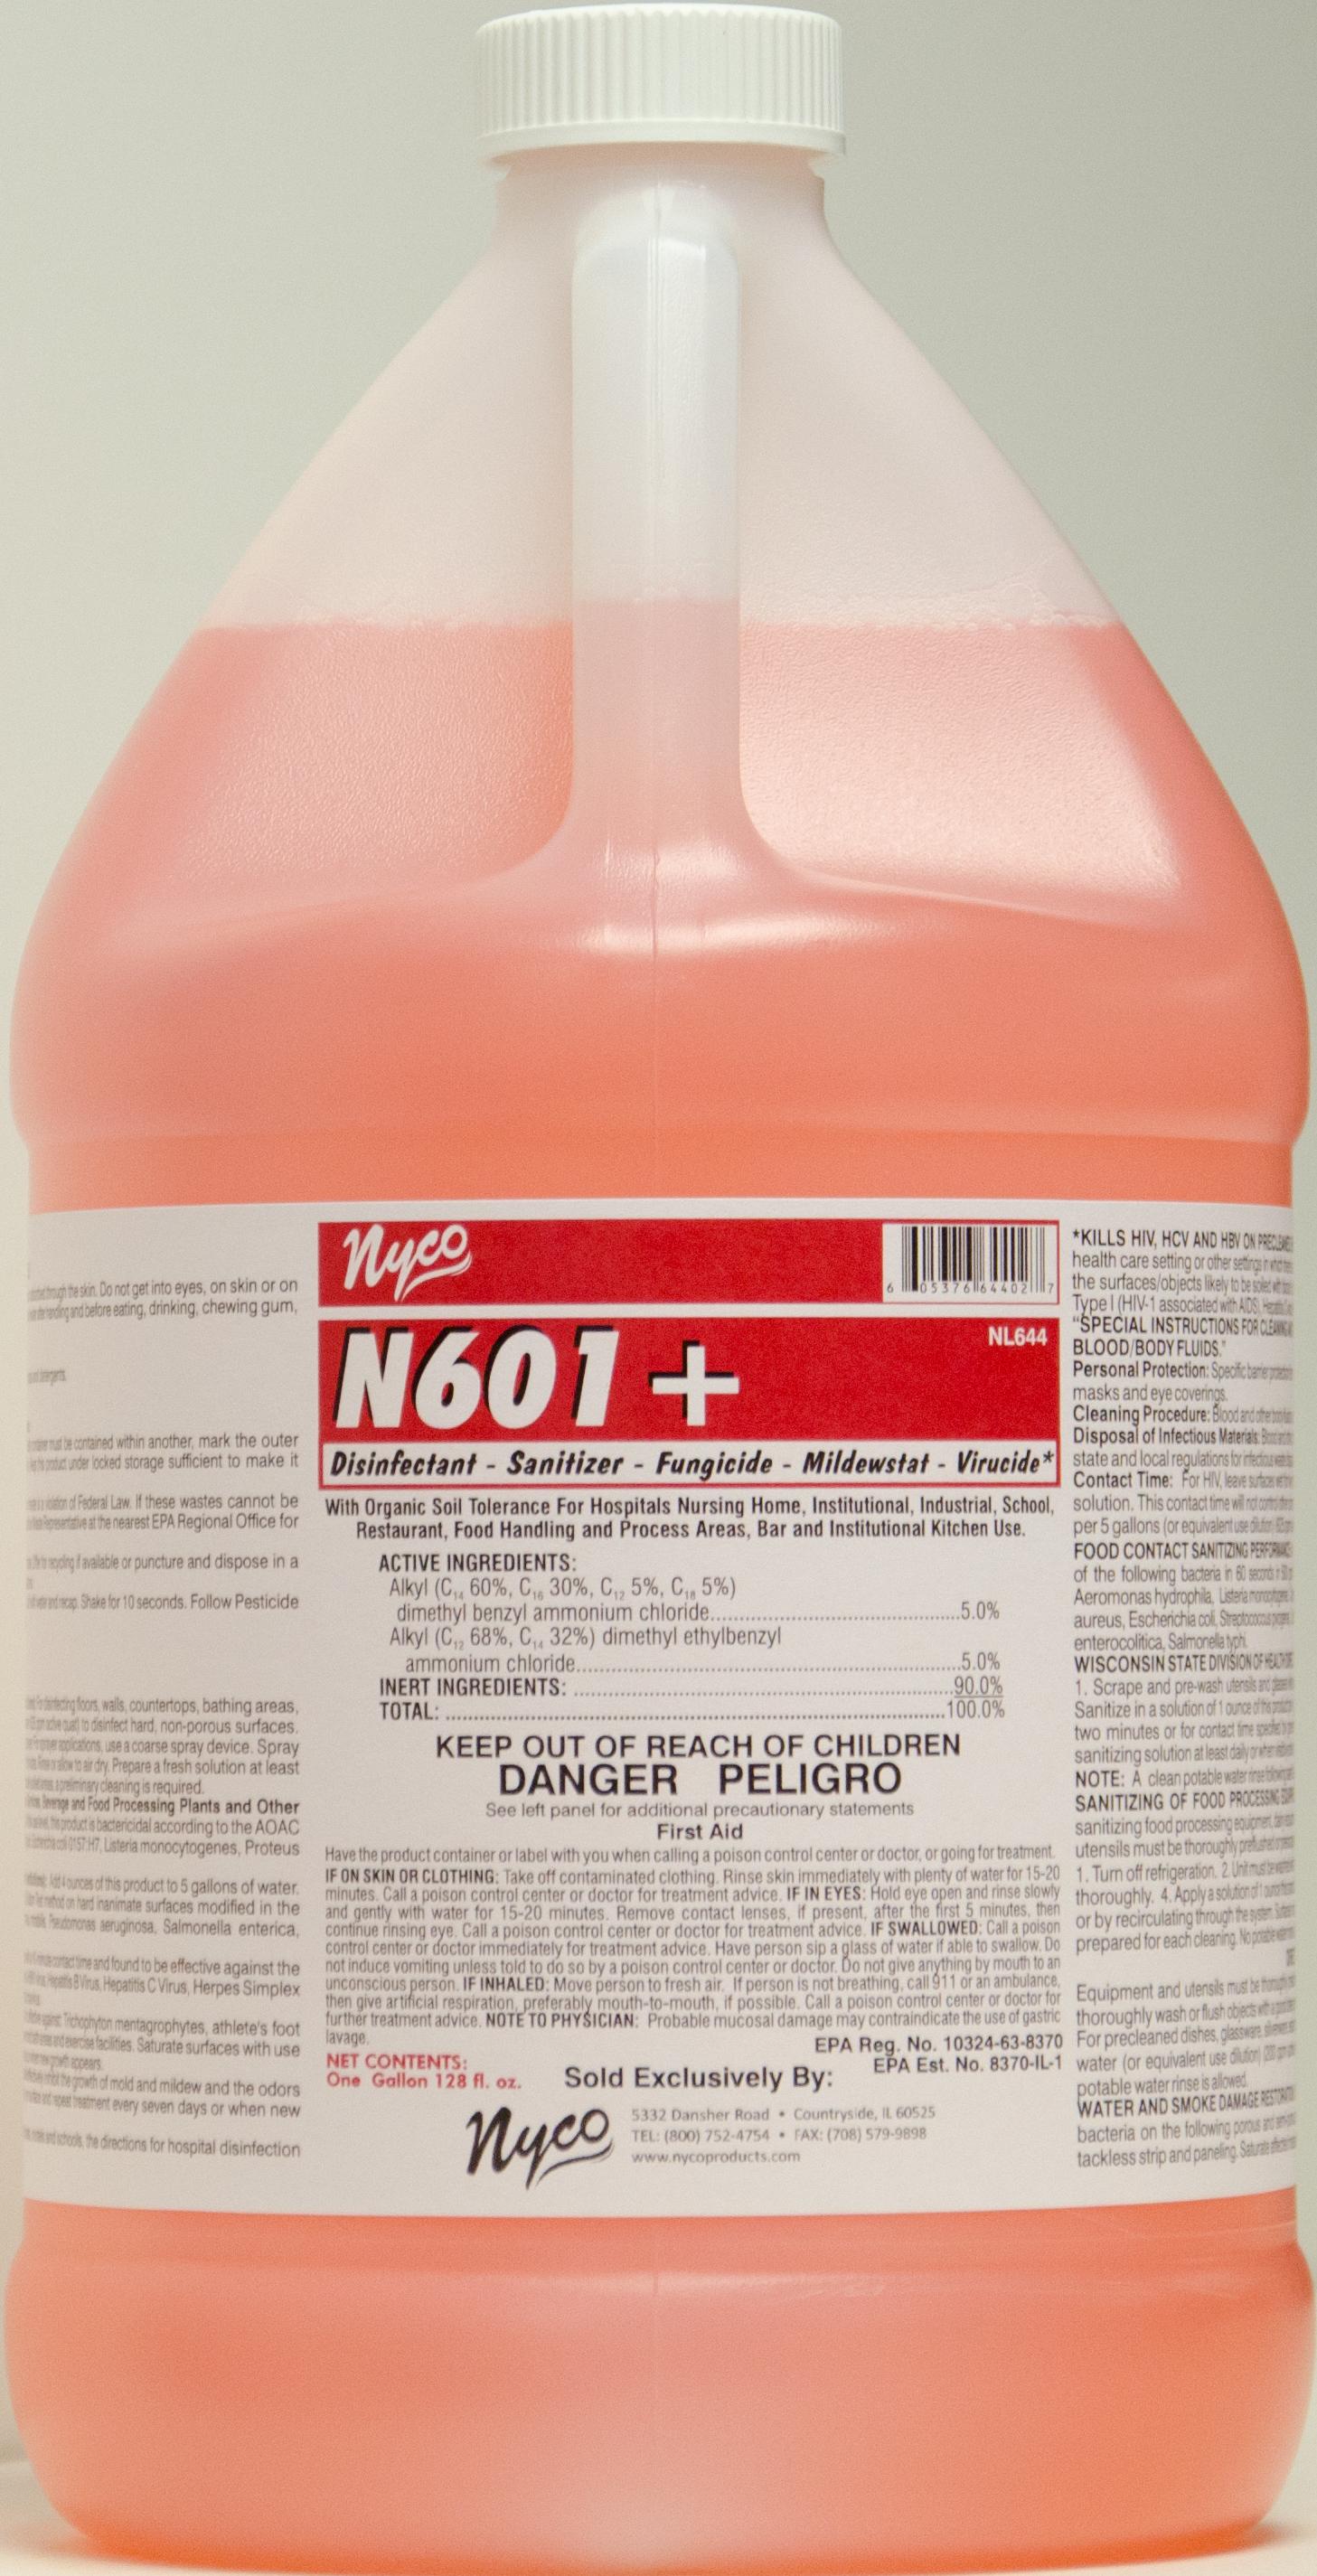 Nyco NL644-G4 n601+